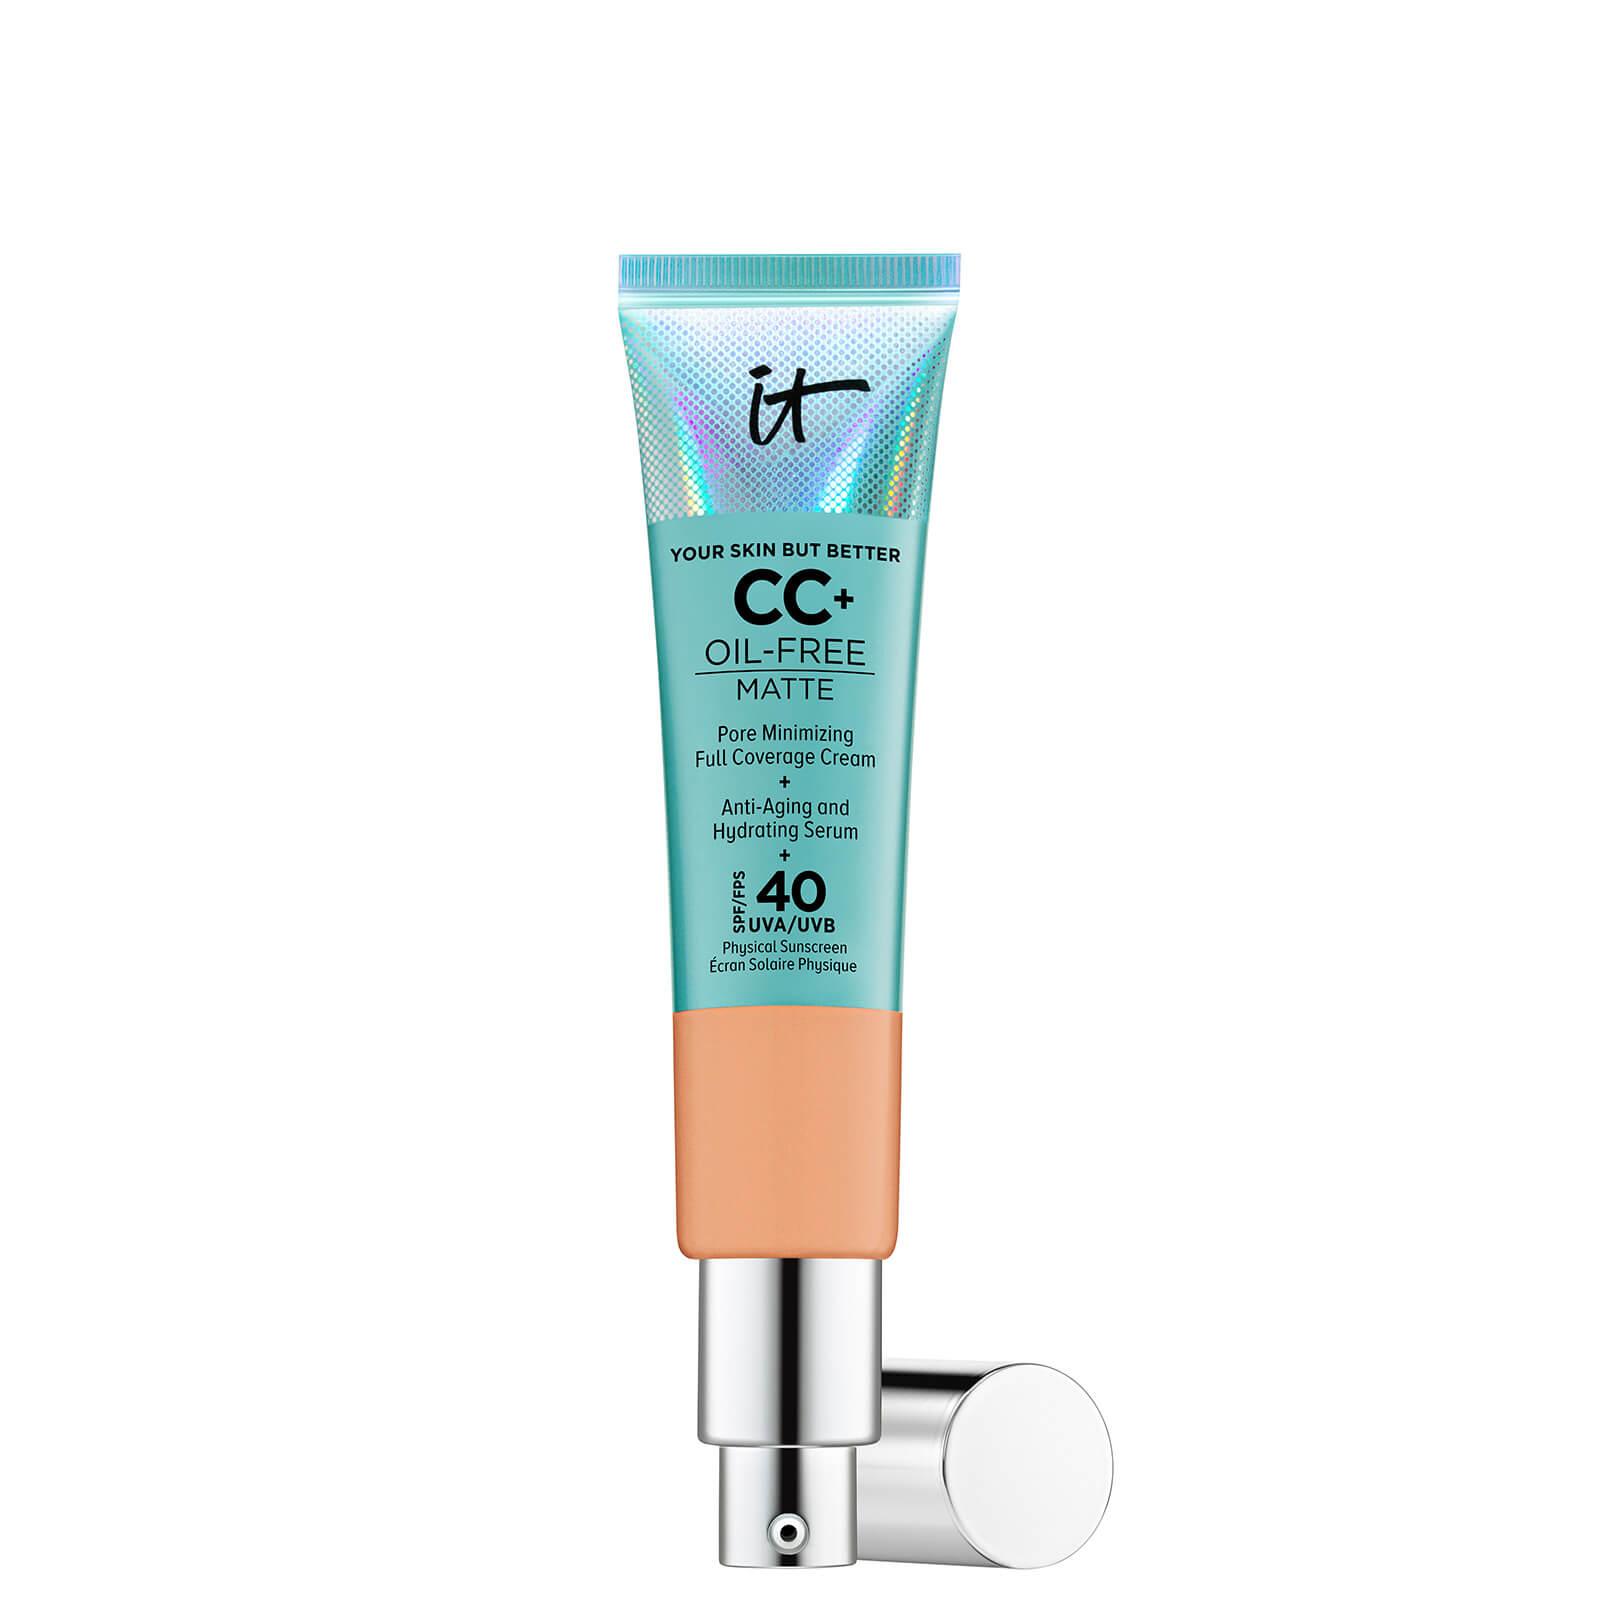 Купить IT Cosmetics Your Skin But Better CC+ Oil-Free Matte SPF40 32ml (Various Shades) - Neutral Tan